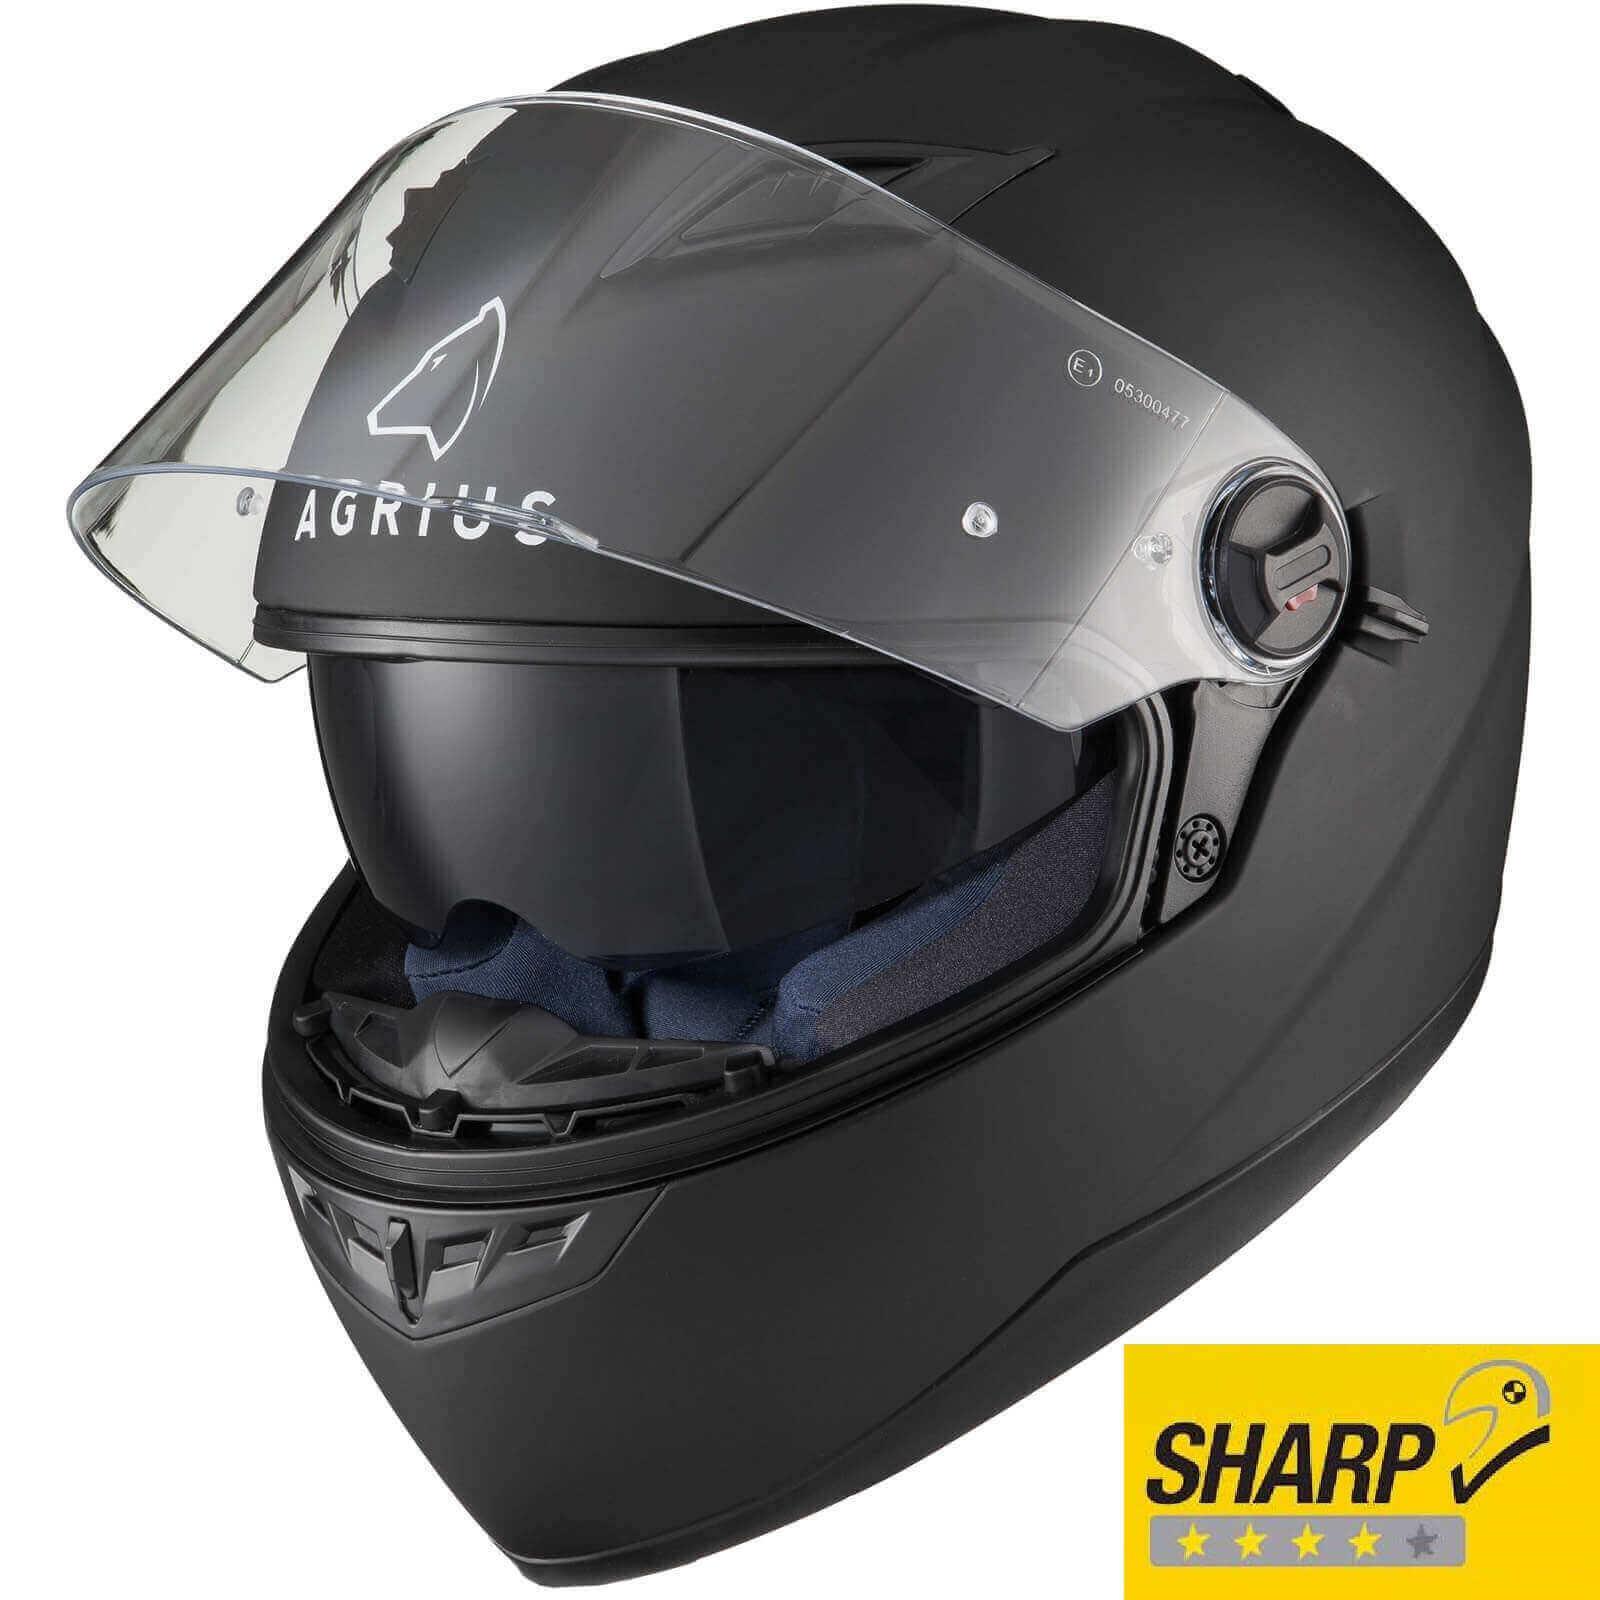 Casca Moto Agrius Rage SV - Negru Mat